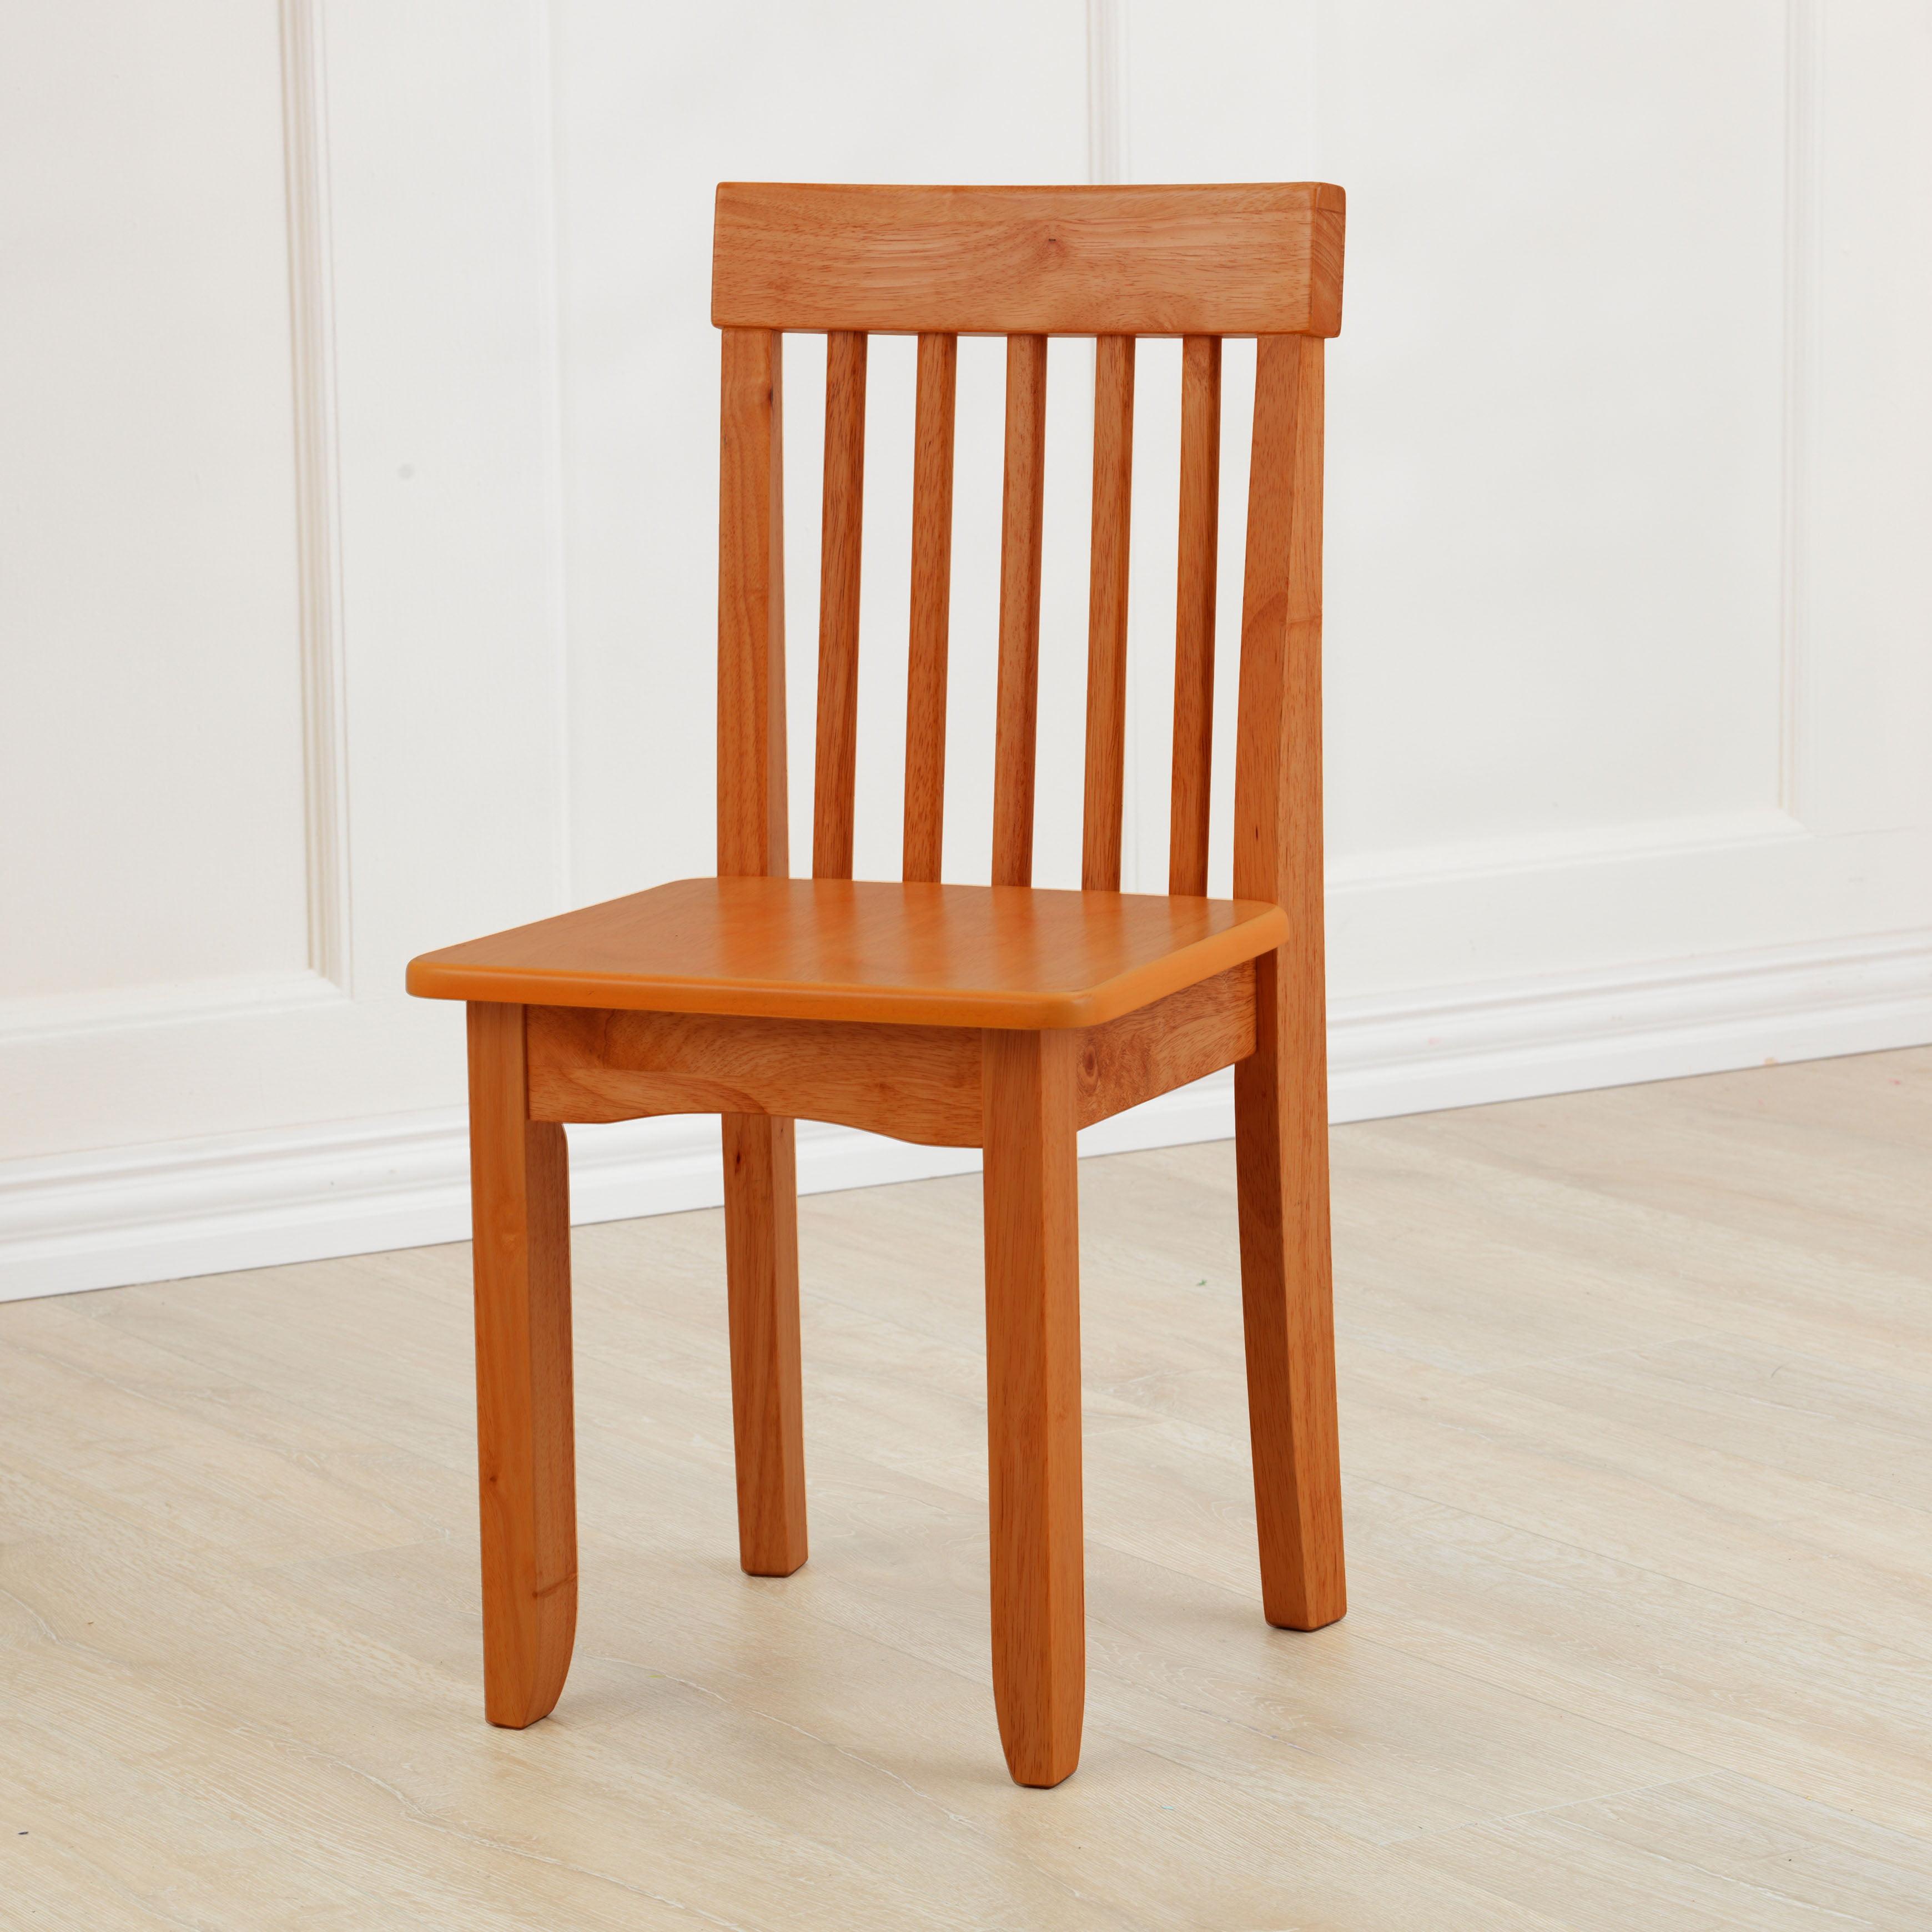 Miraculous Kidkraft Avalon Wooden Single Classic Back Desk Chair For Children Honey Cjindustries Chair Design For Home Cjindustriesco